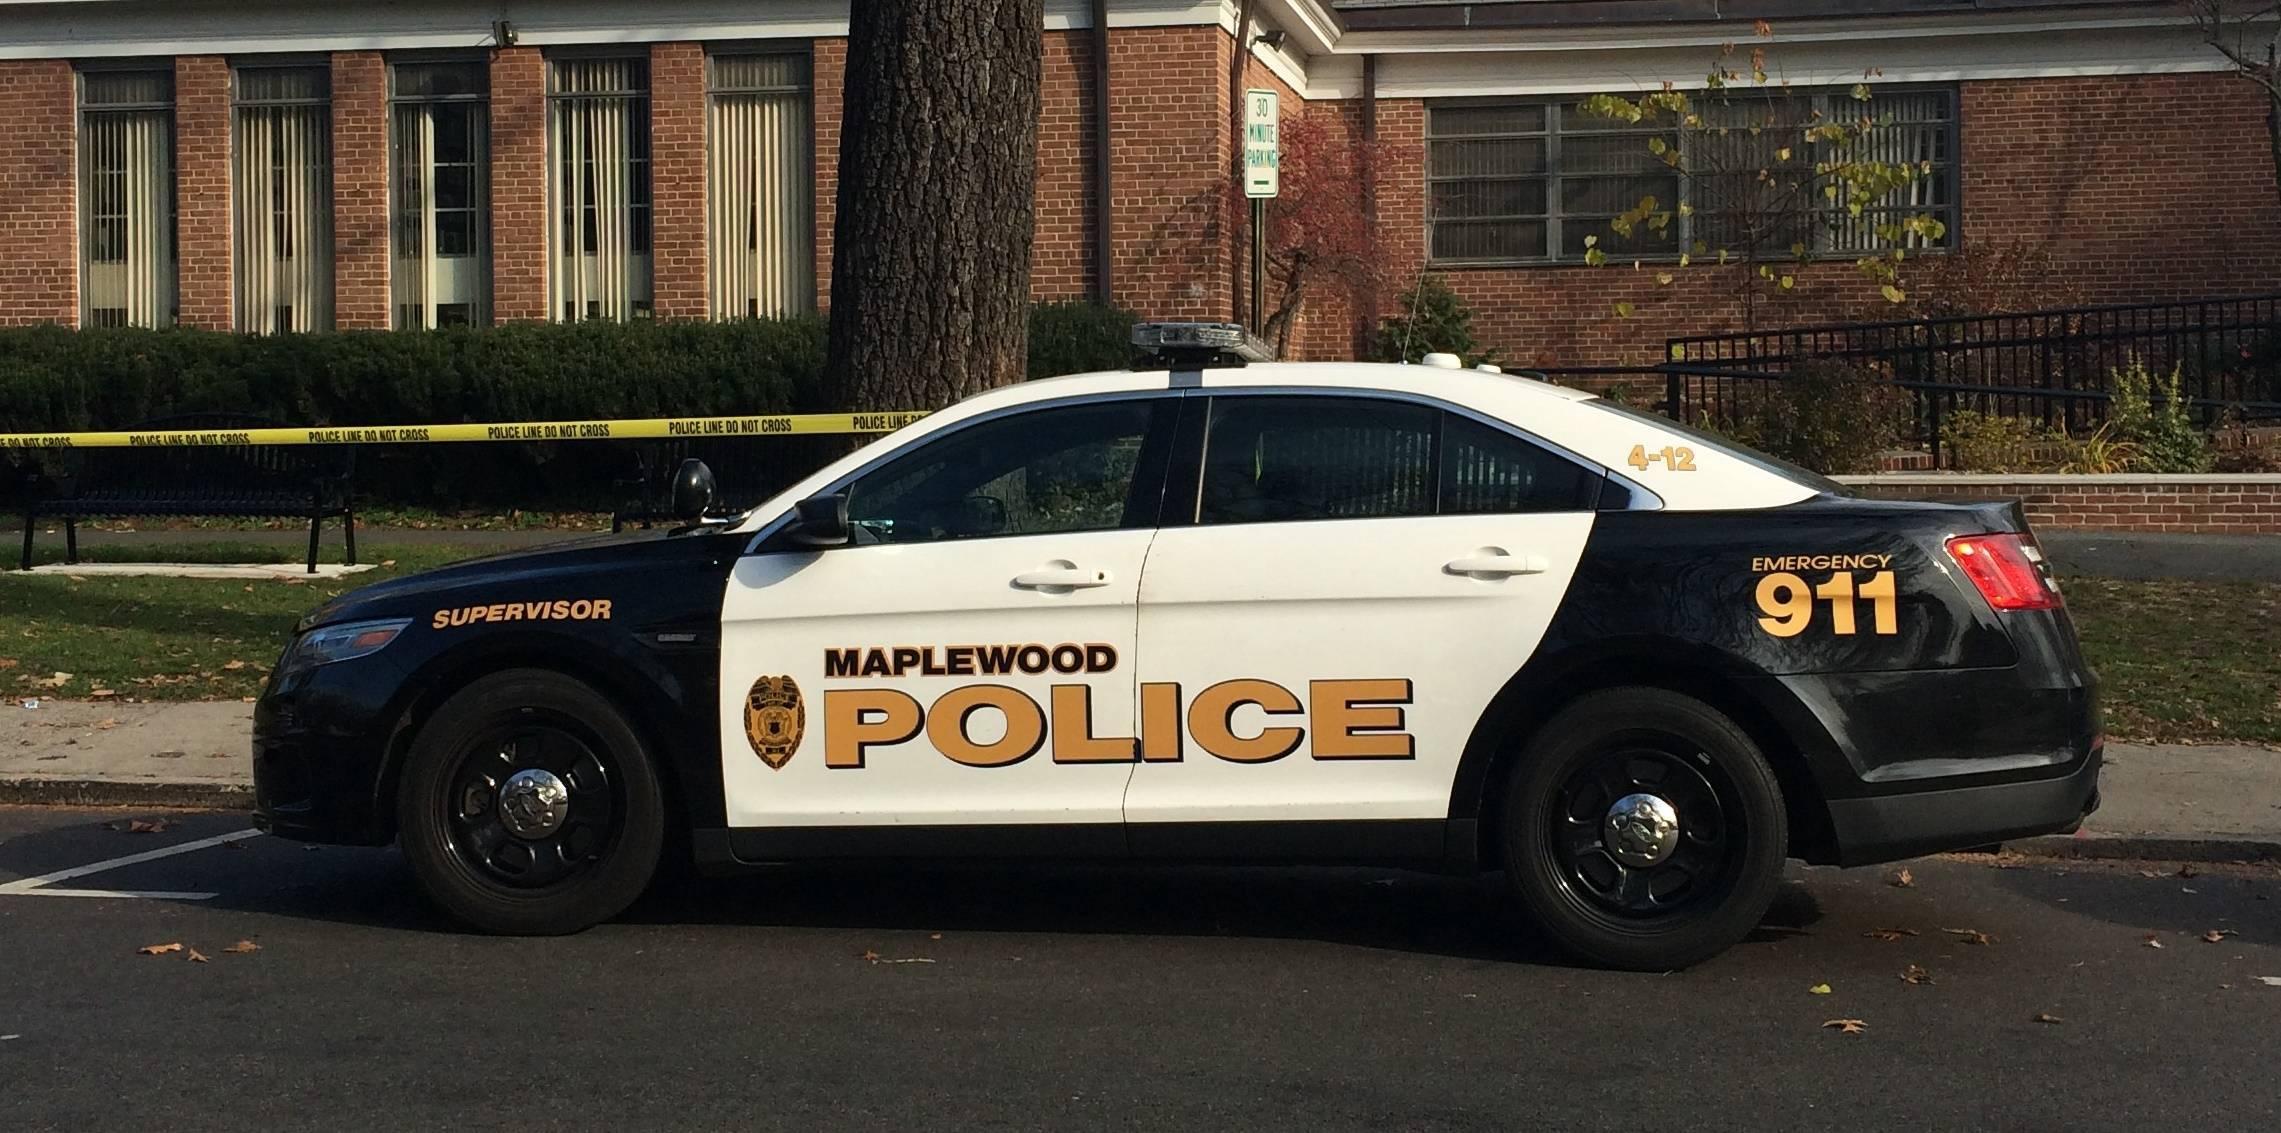 2e1dc93b5af903d463ba_Maplewood_police_car_2.jpg